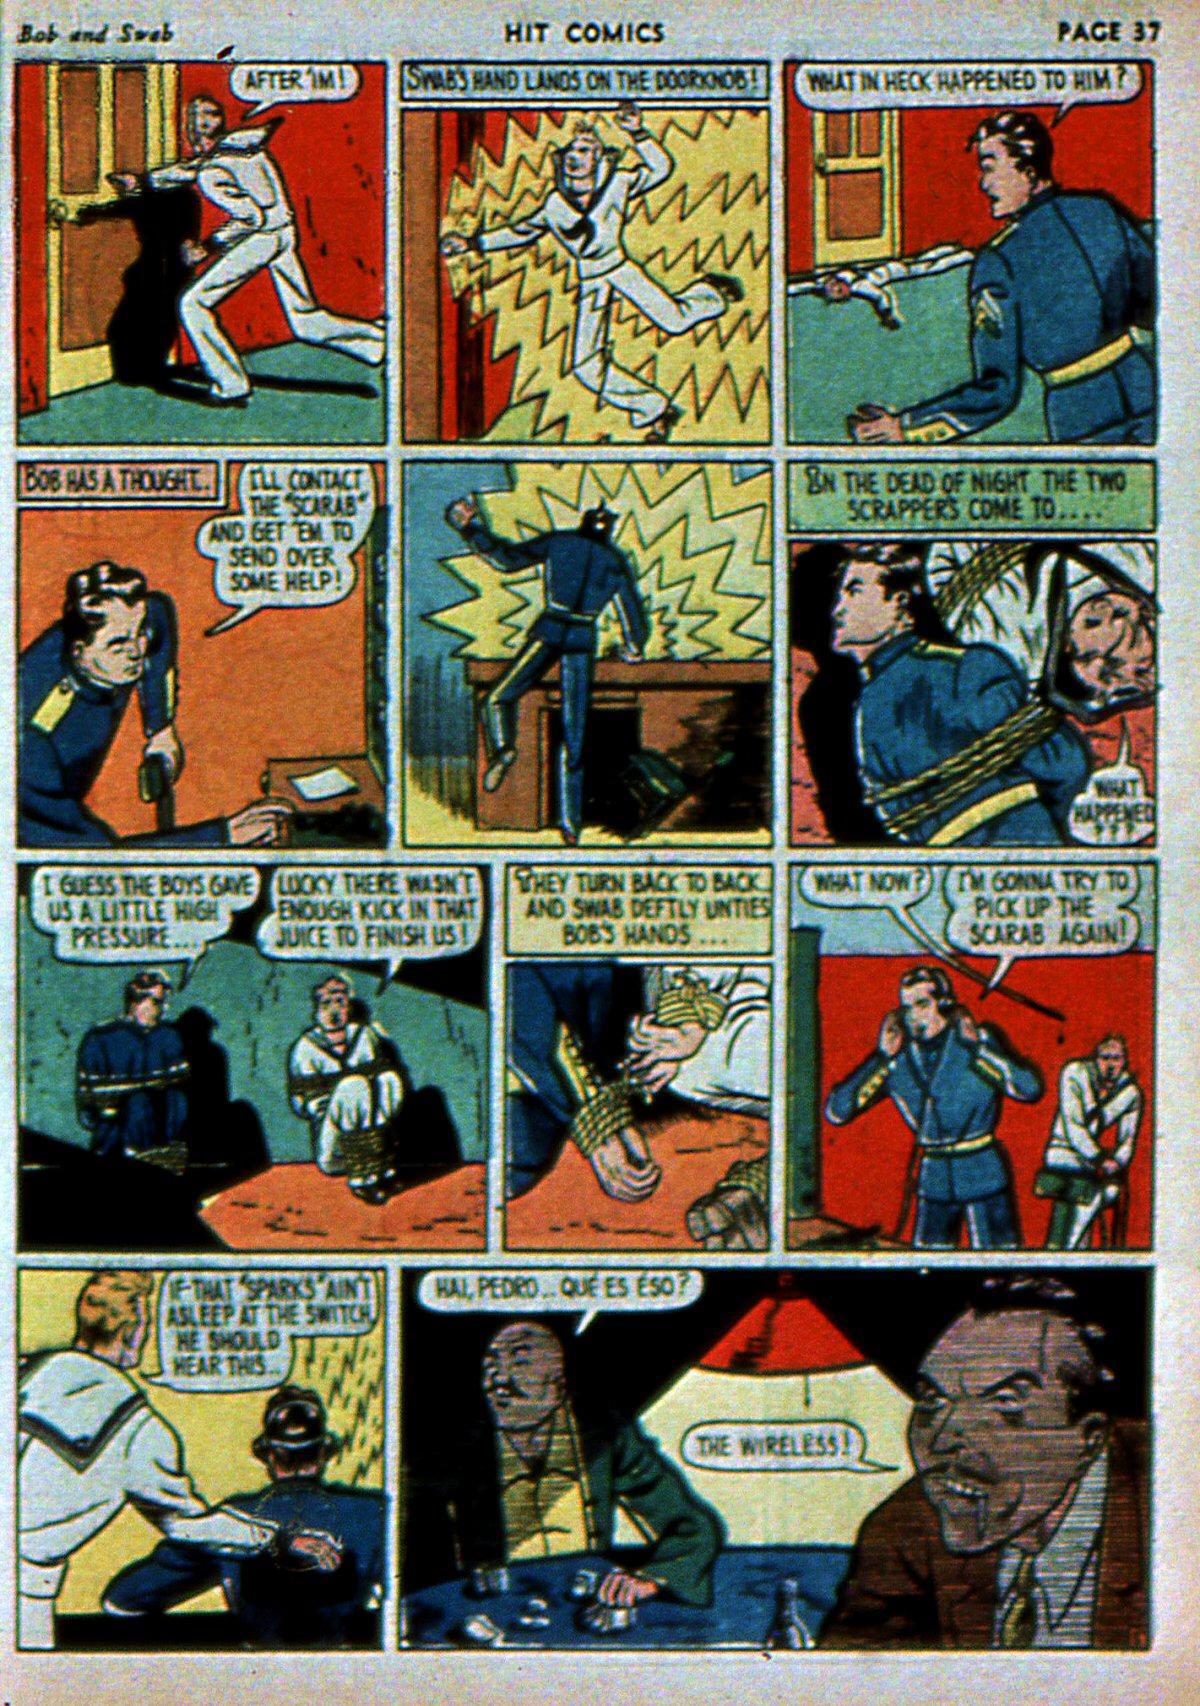 Read online Hit Comics comic -  Issue #3 - 39